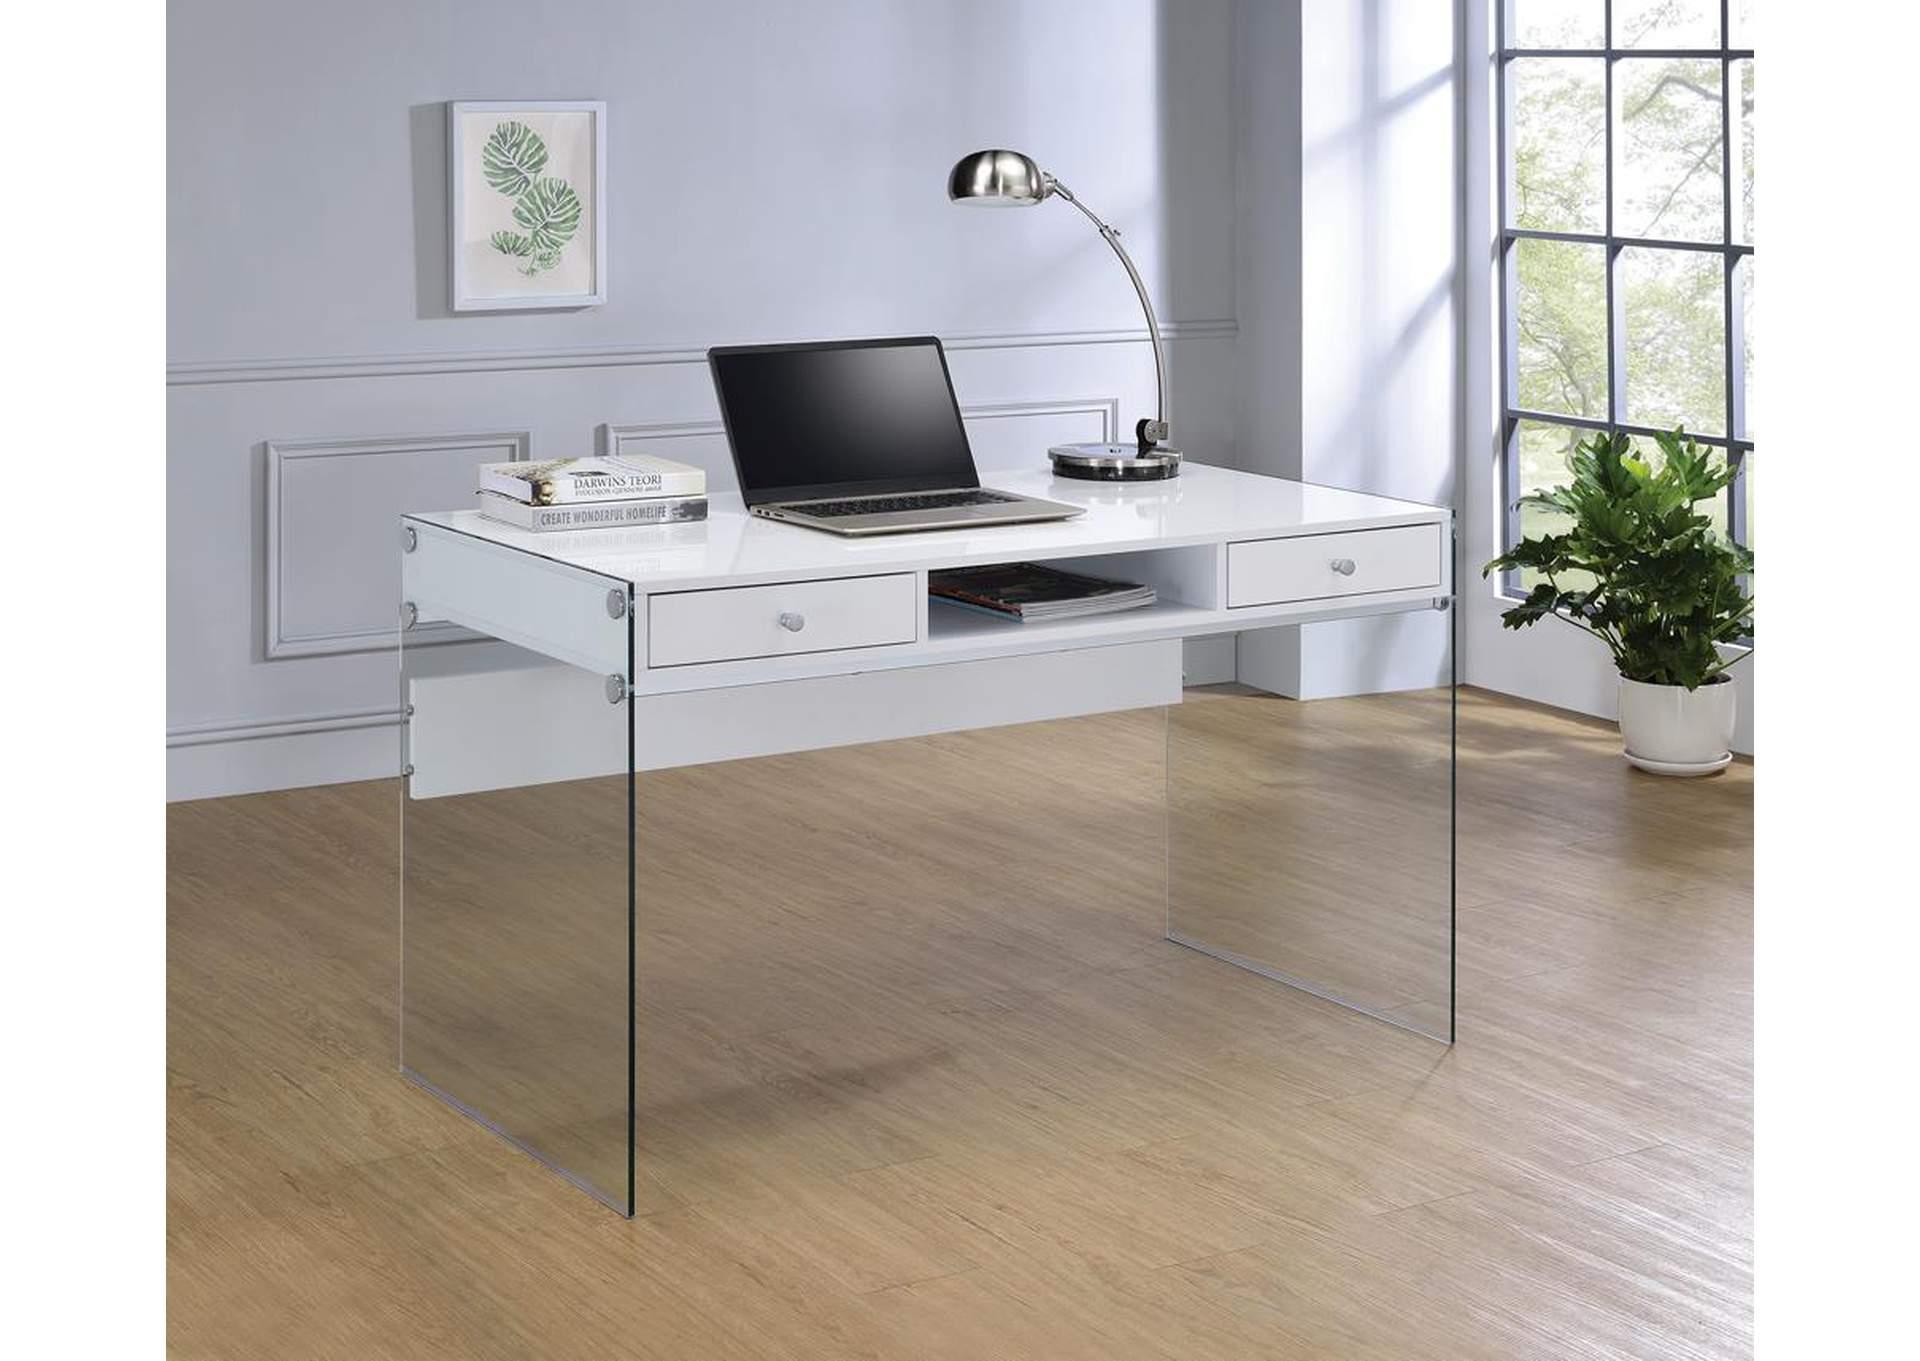 Furniture Merchandise Outlet Murfreesboro Hermitage Tn Glossy White Computer Desk